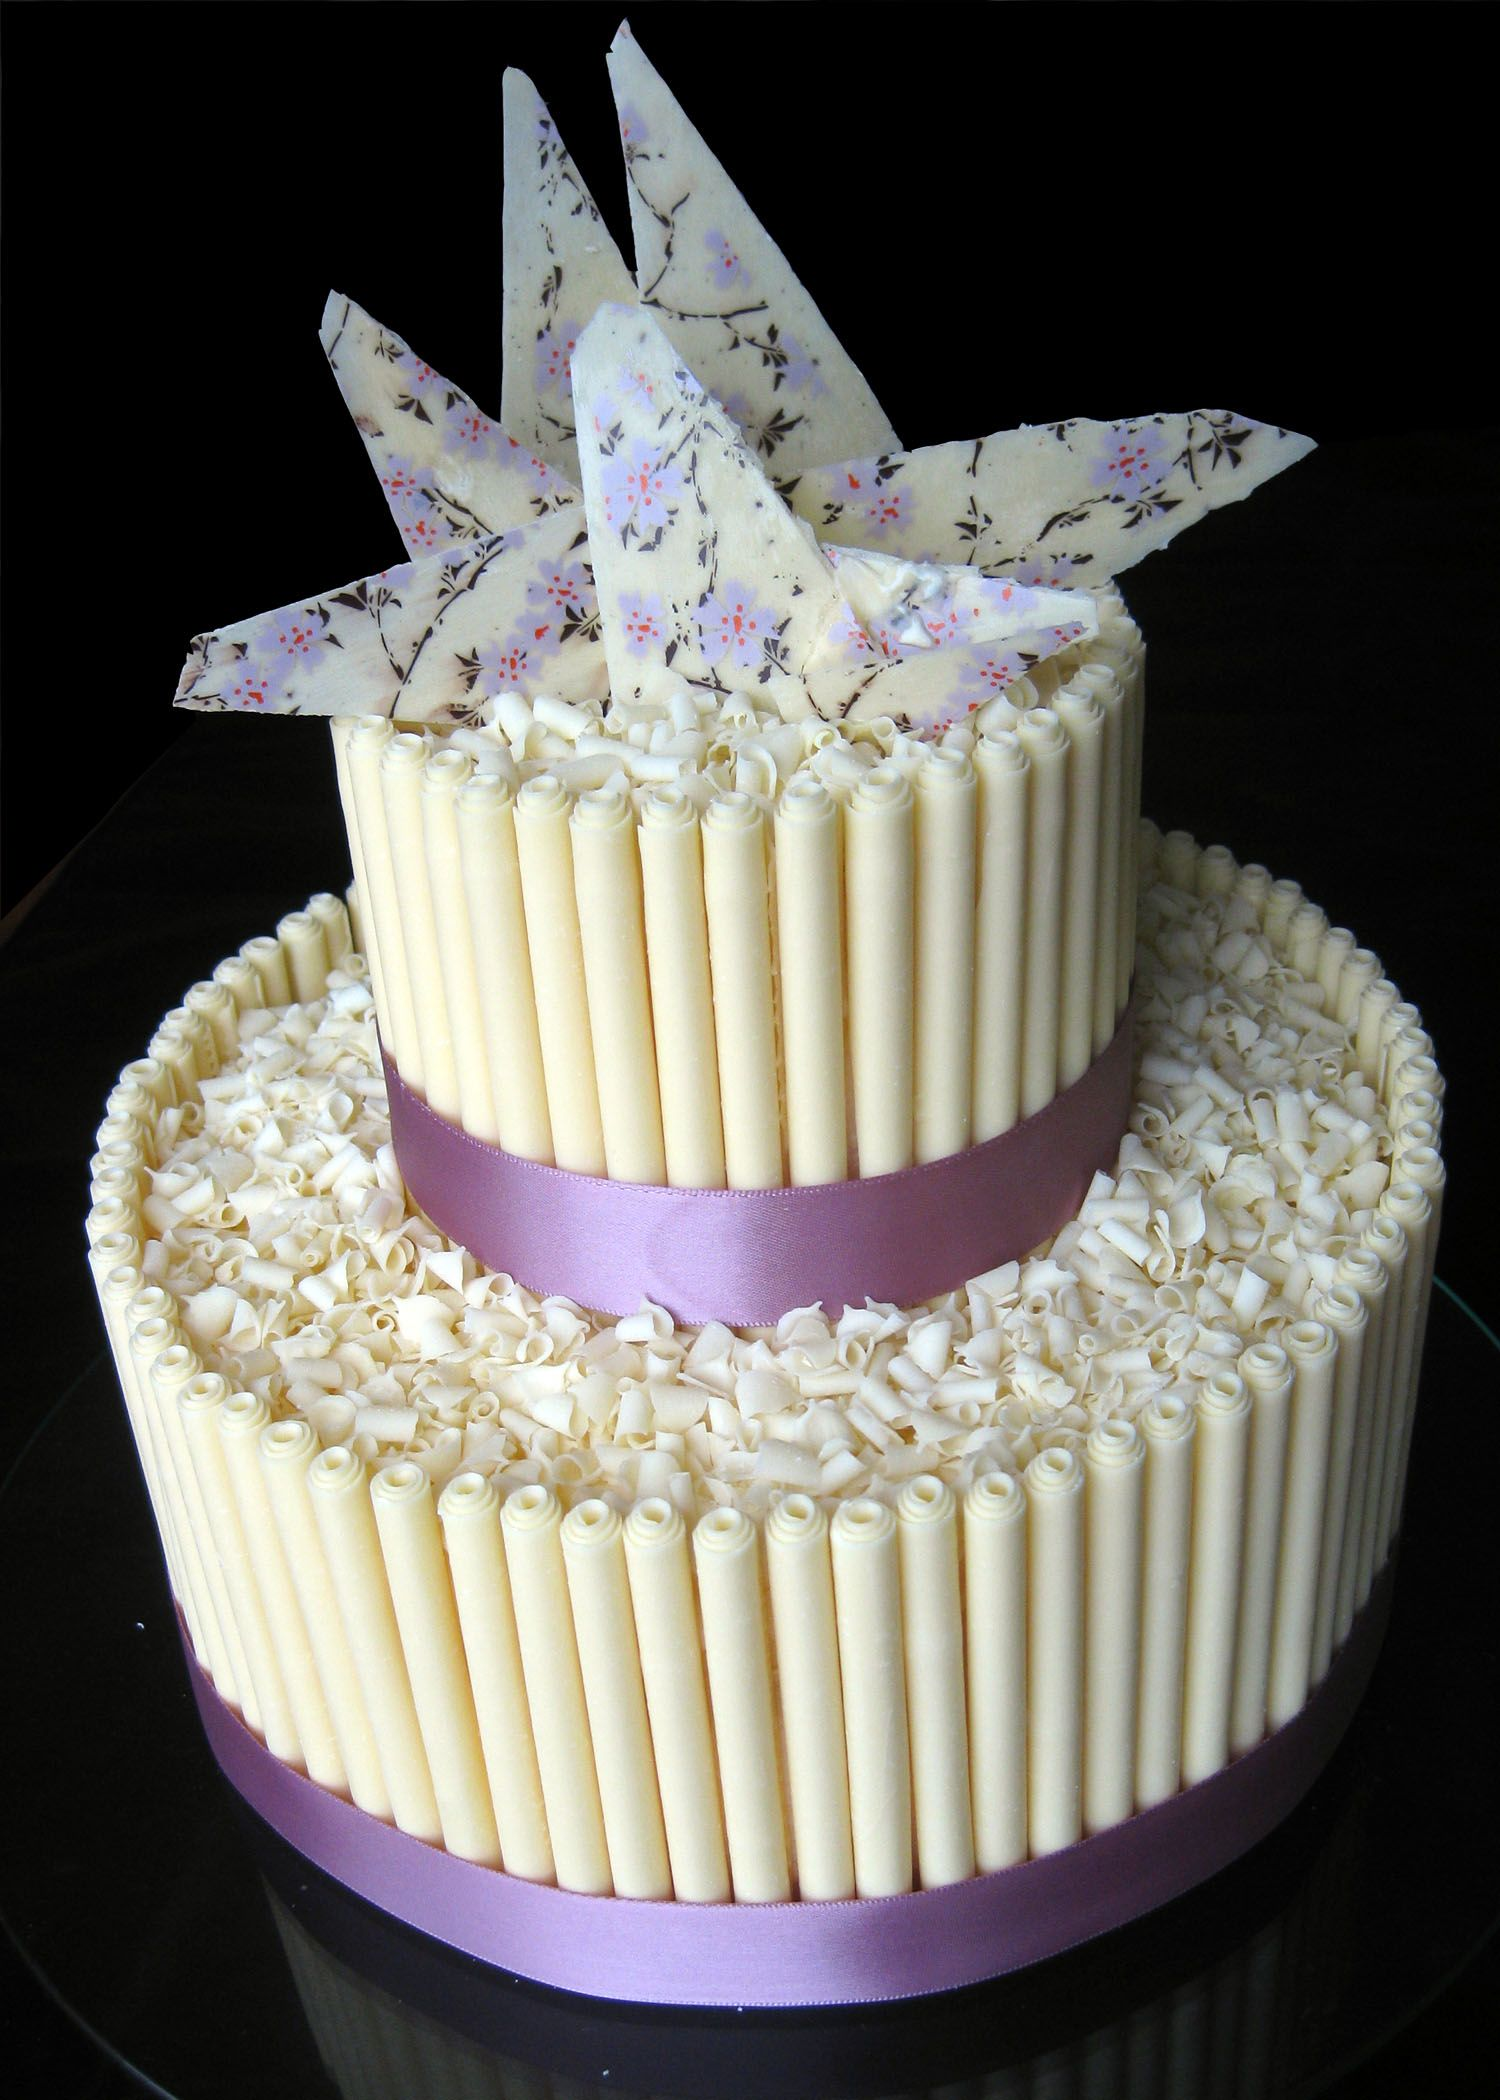 White Chocolate Cake My Favorite I Heart Cakes Pinterest